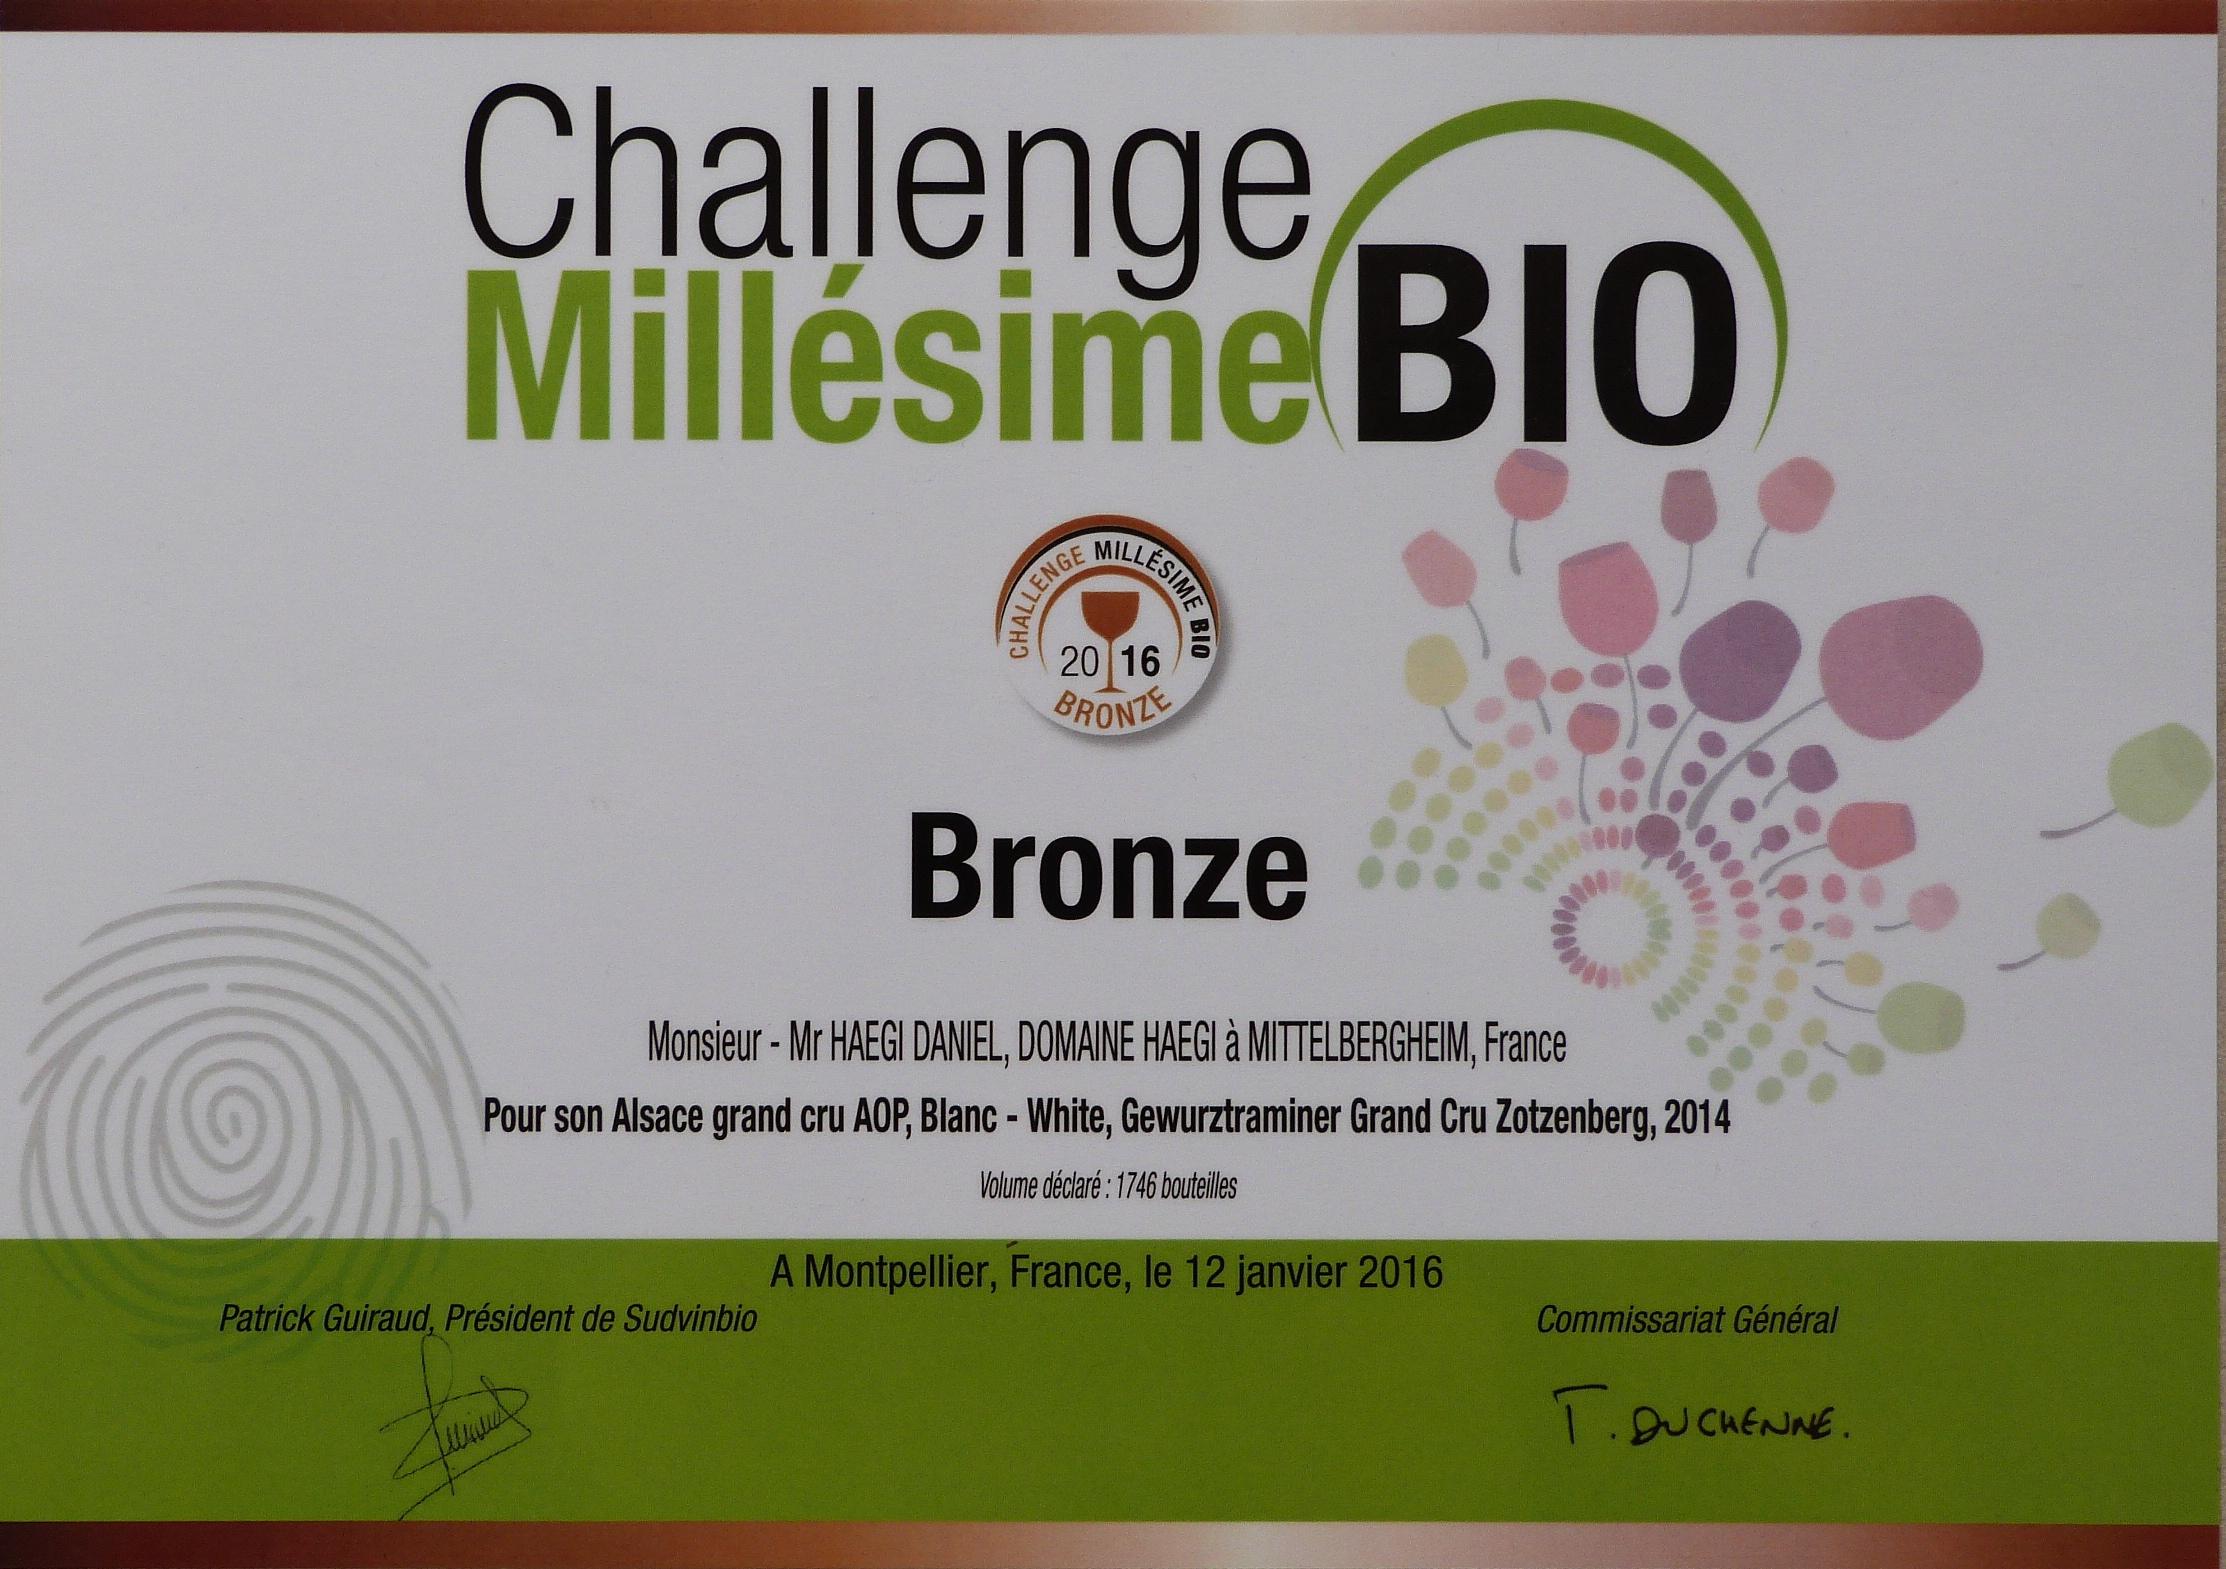 Gewurtraminer Grand Cru Zotzenberg 2014 Médaille de Bronze Challenge Millésime Bio 2016